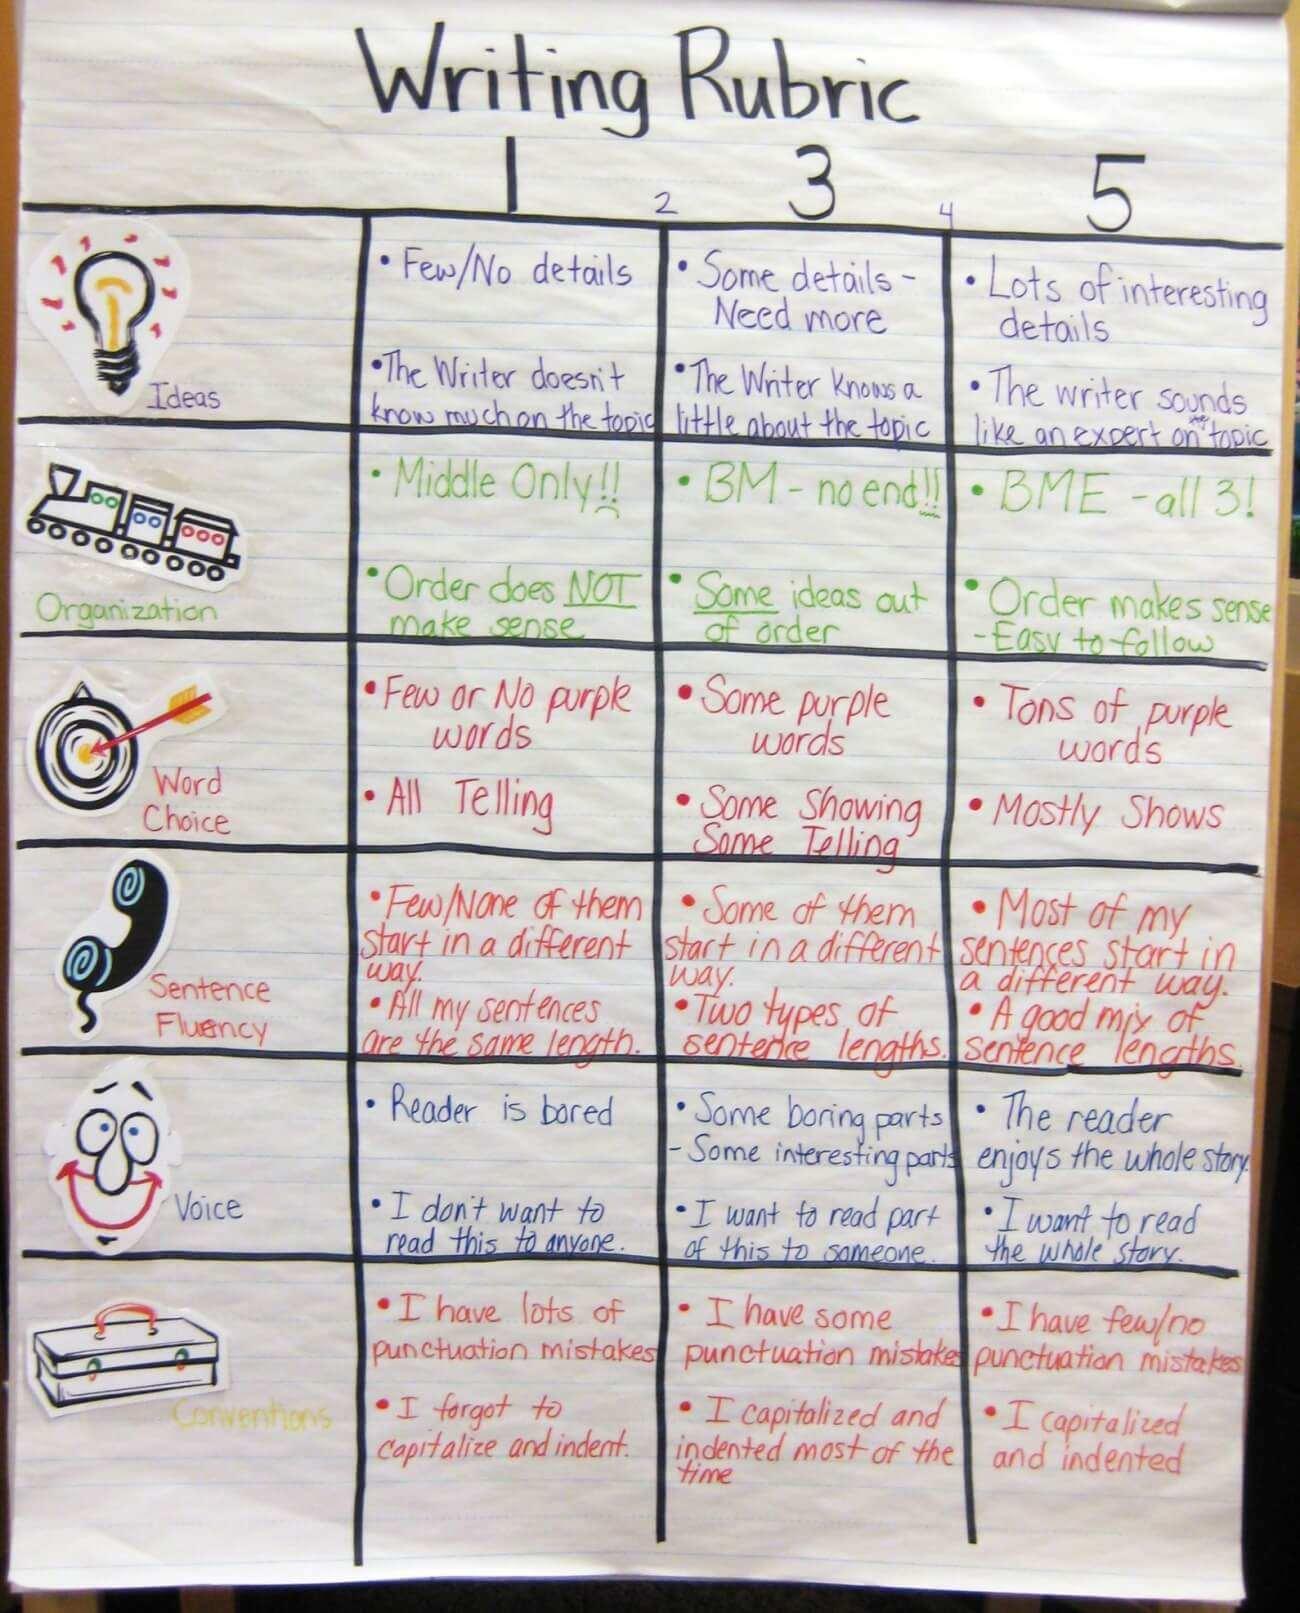 Kid-Friendly Writing Rubric: Susan Thomas, Prostman Elementary